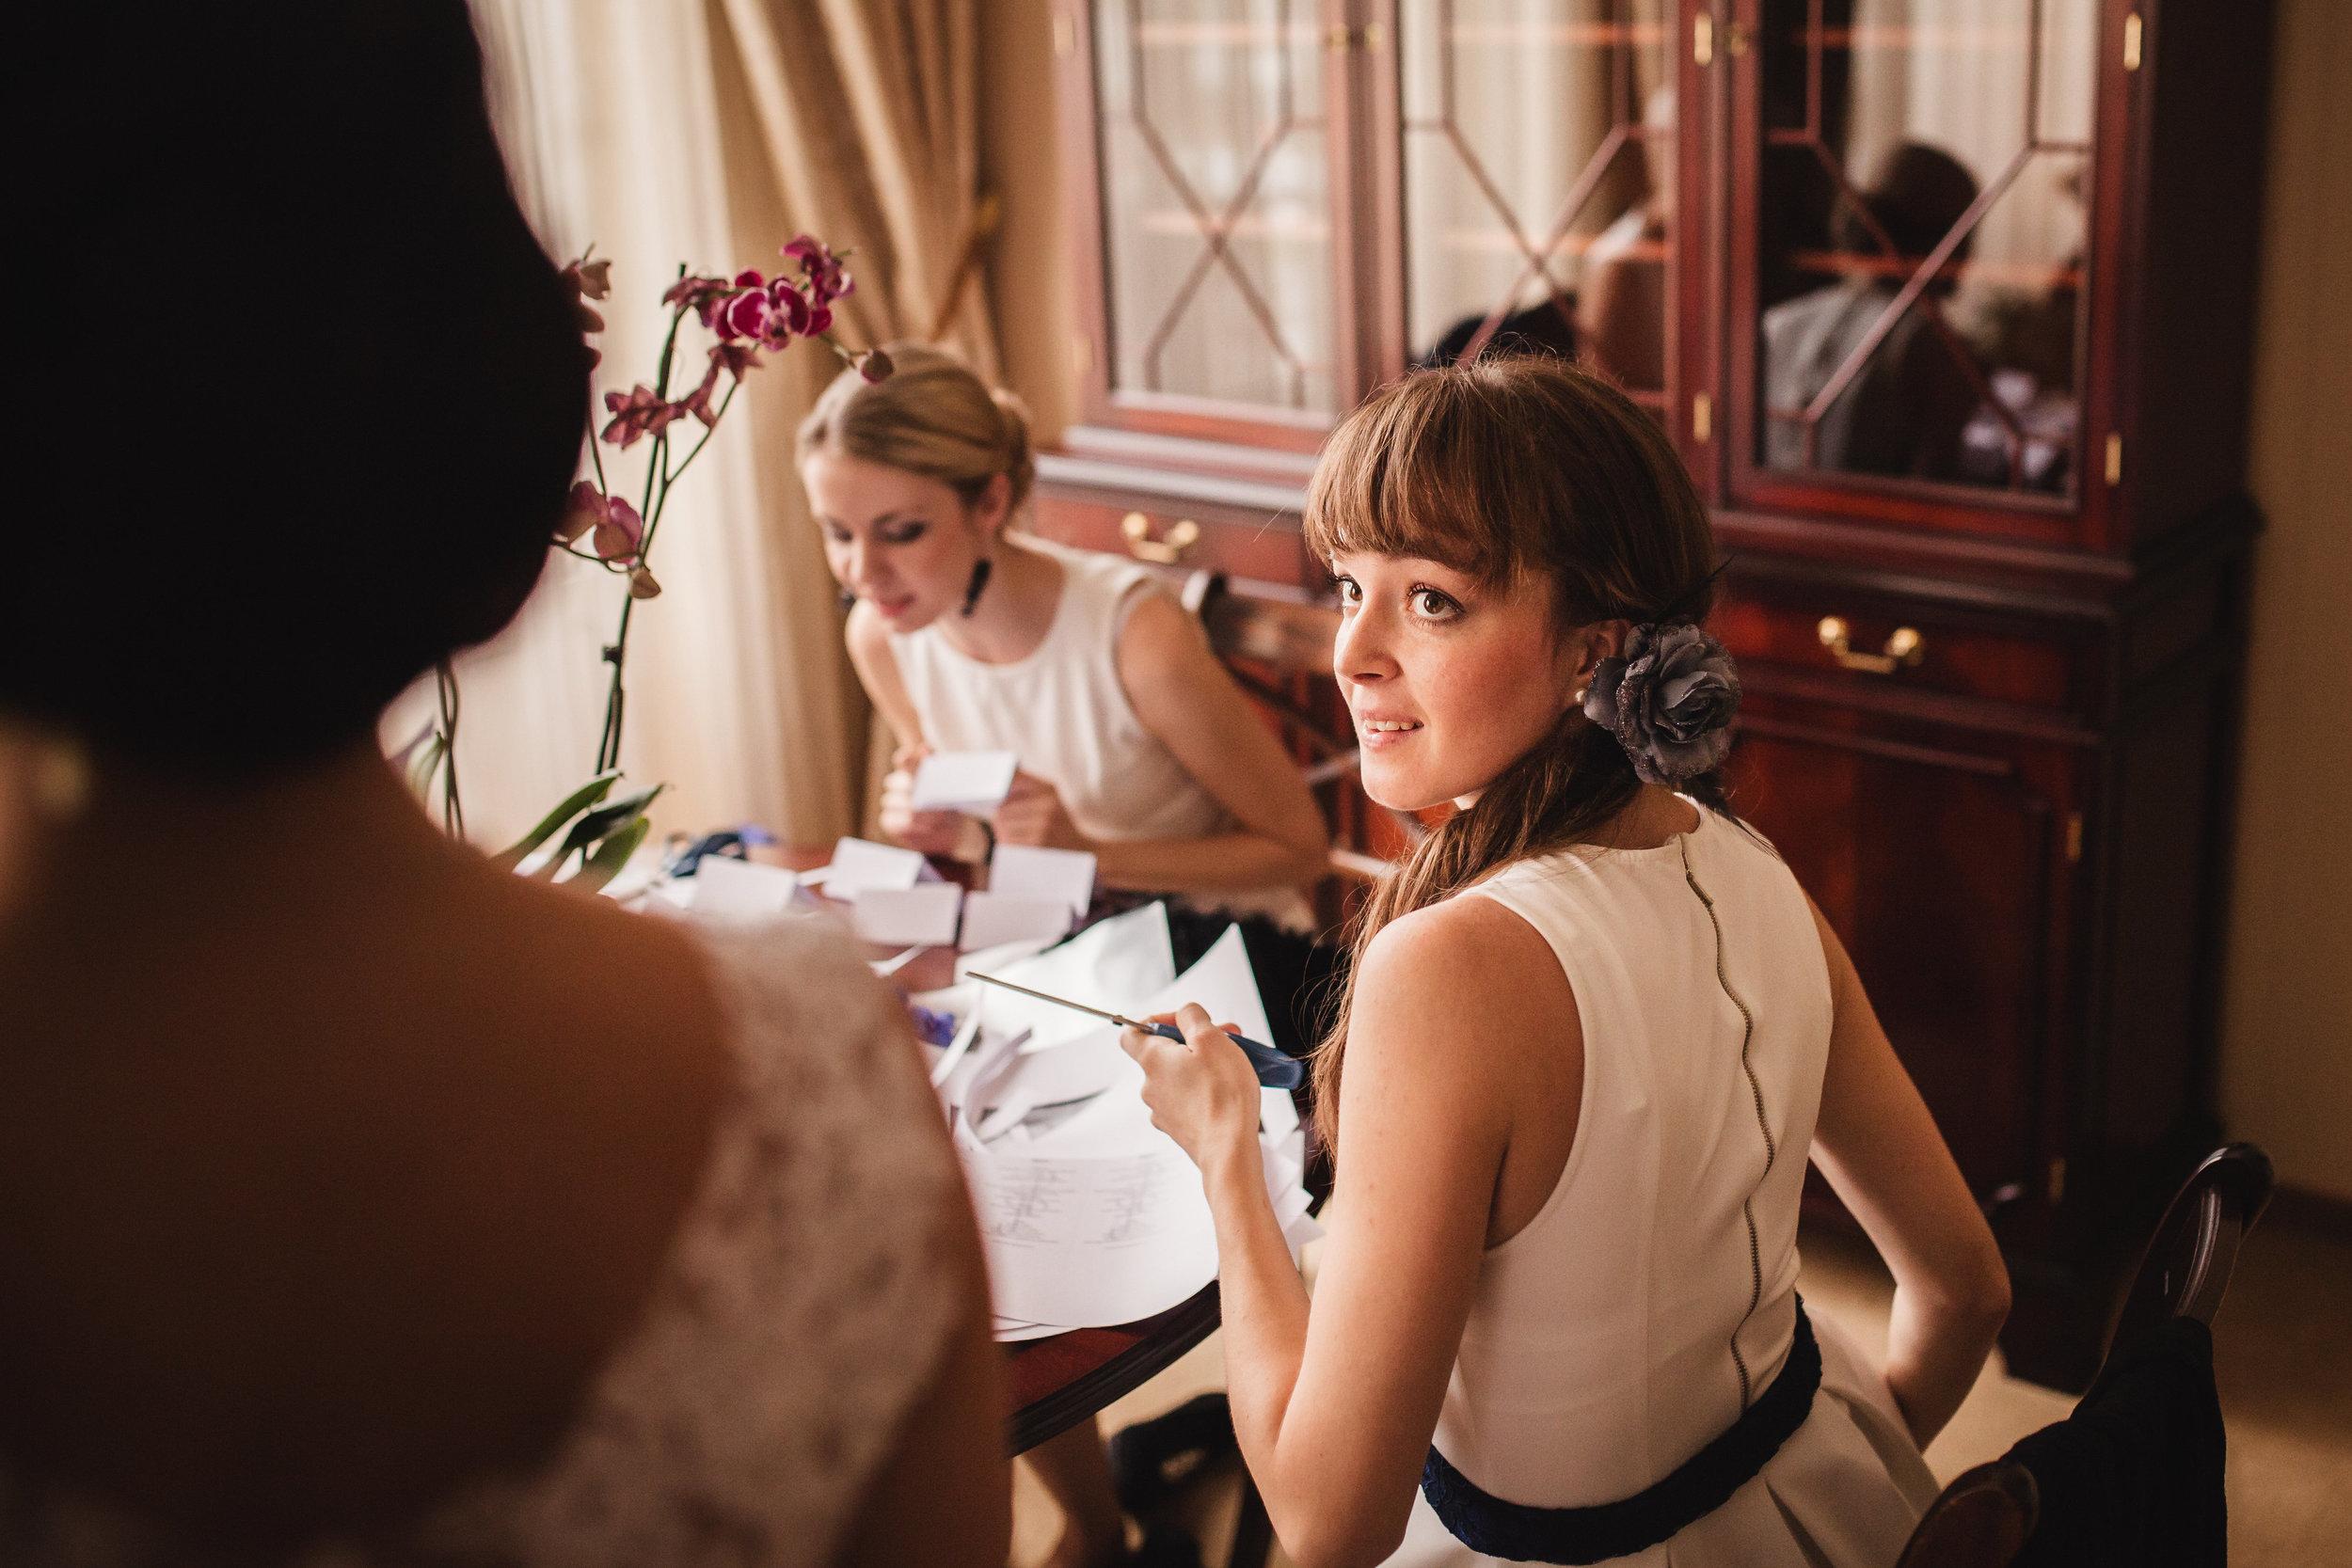 destination-wedding-photographer-bratislava-slovakia-europe-preparation.jpg